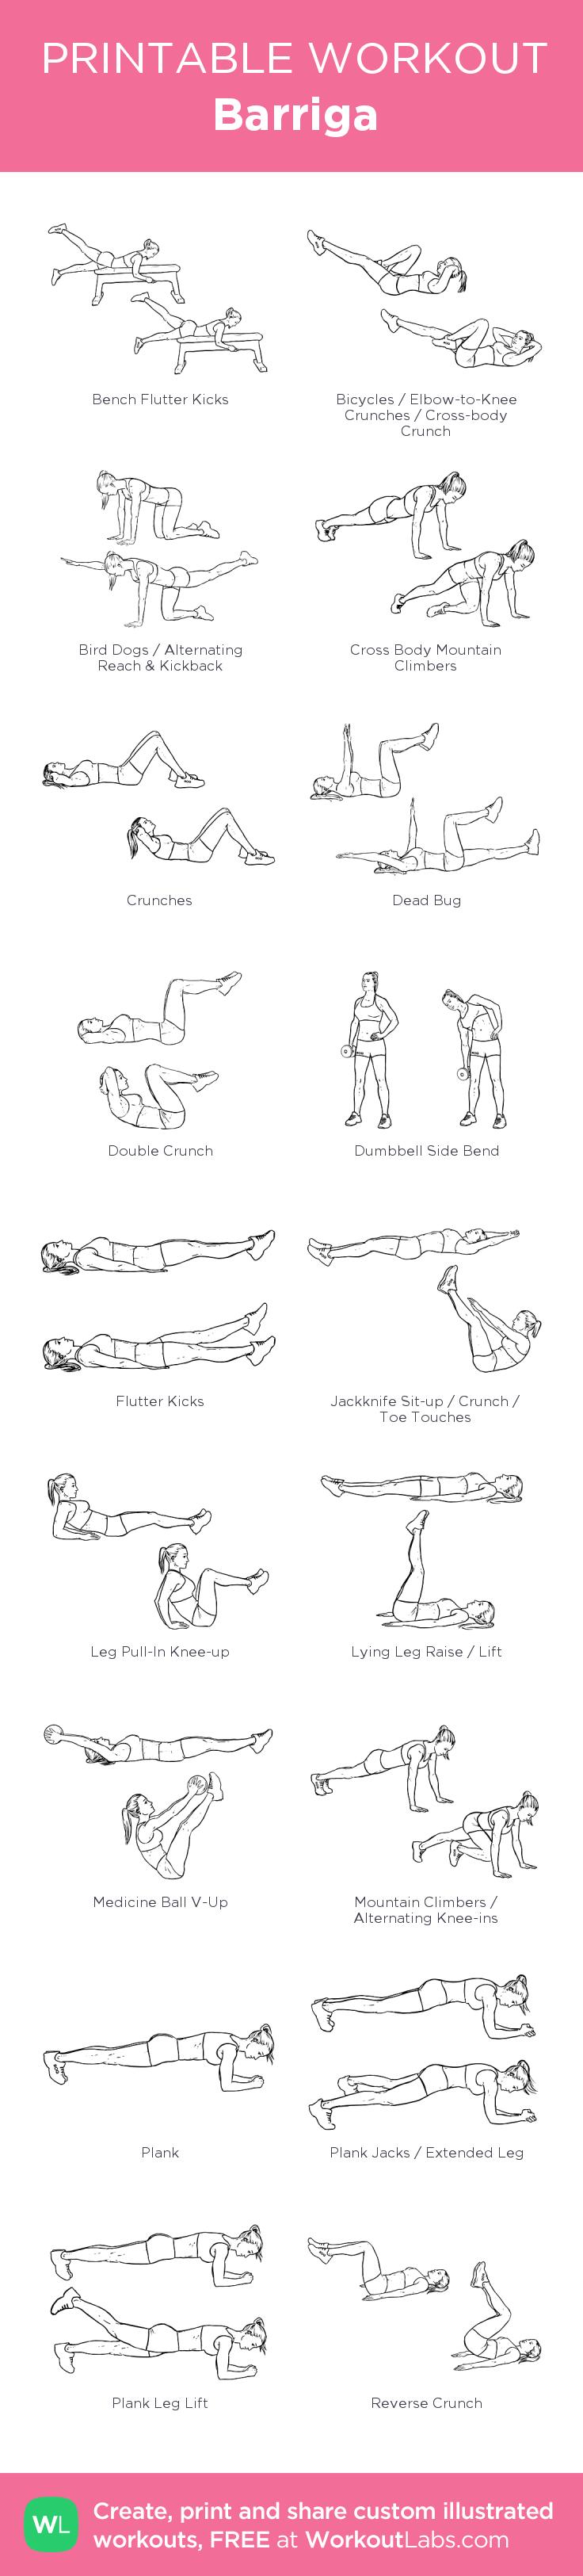 Barriga: my visual workout created at WorkoutLabs com